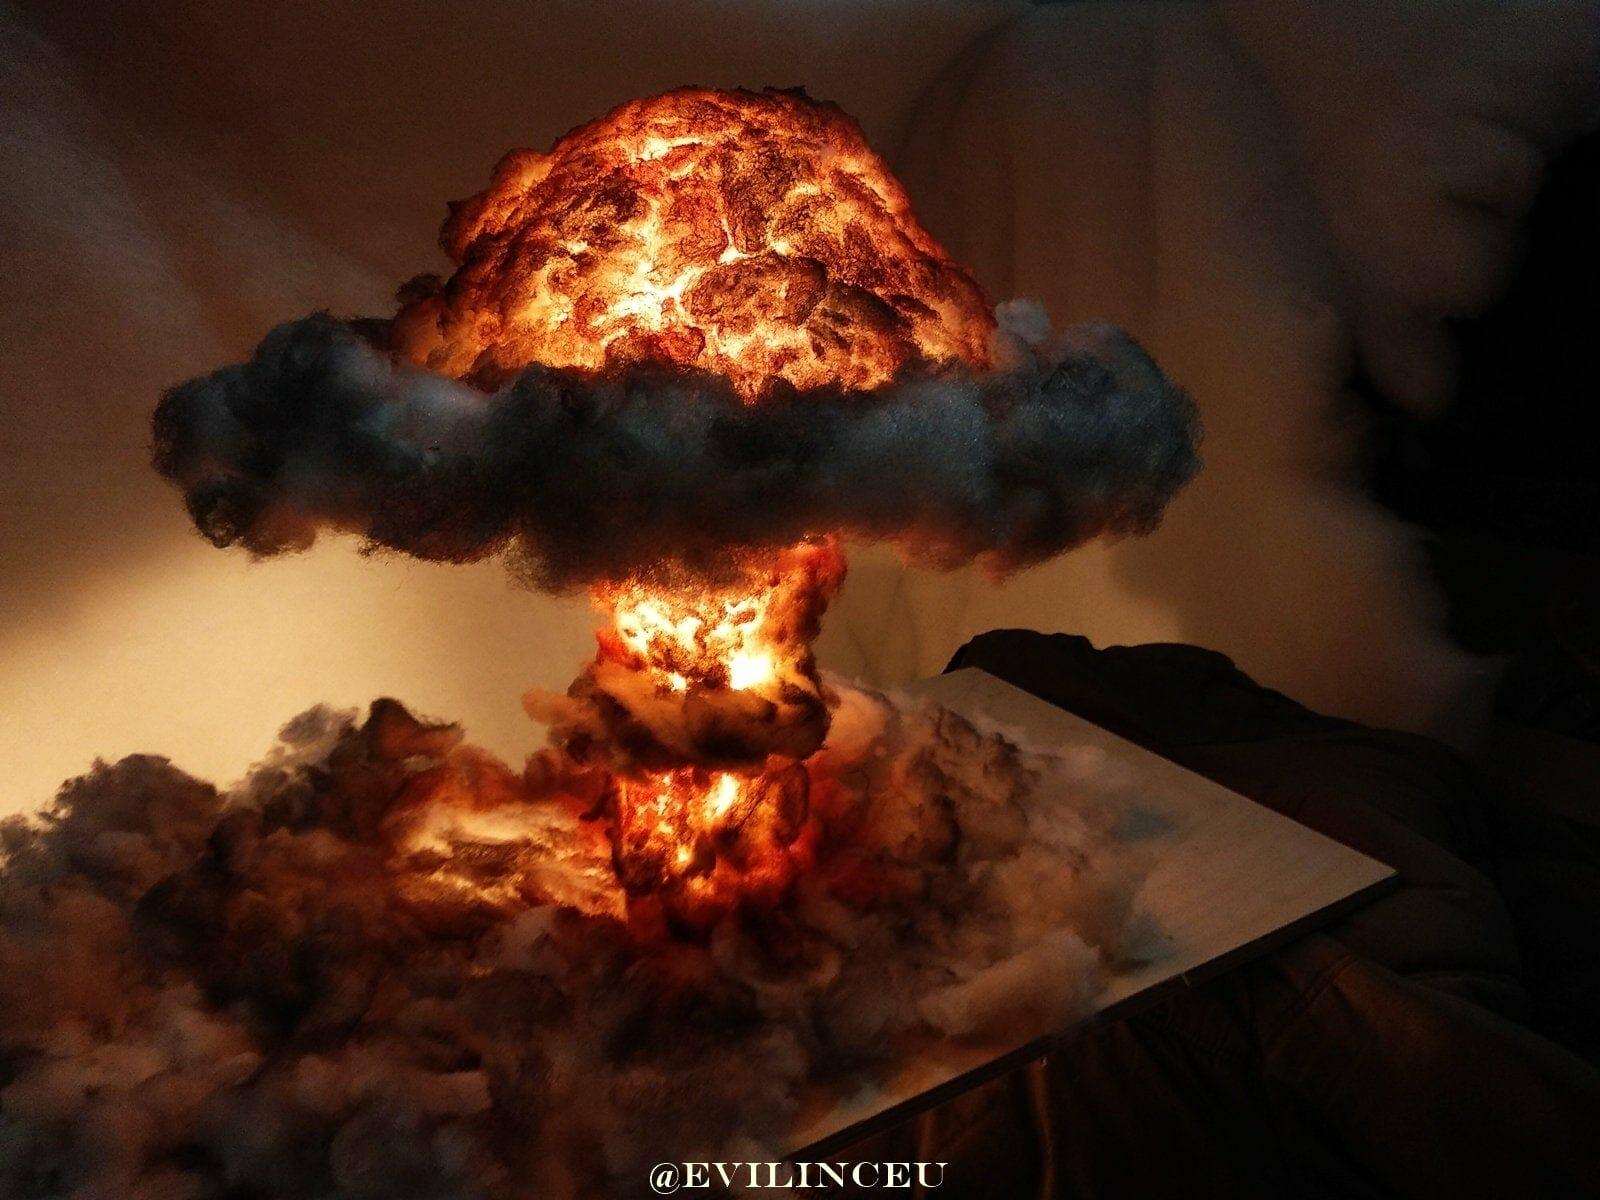 Bomb blast light diorama